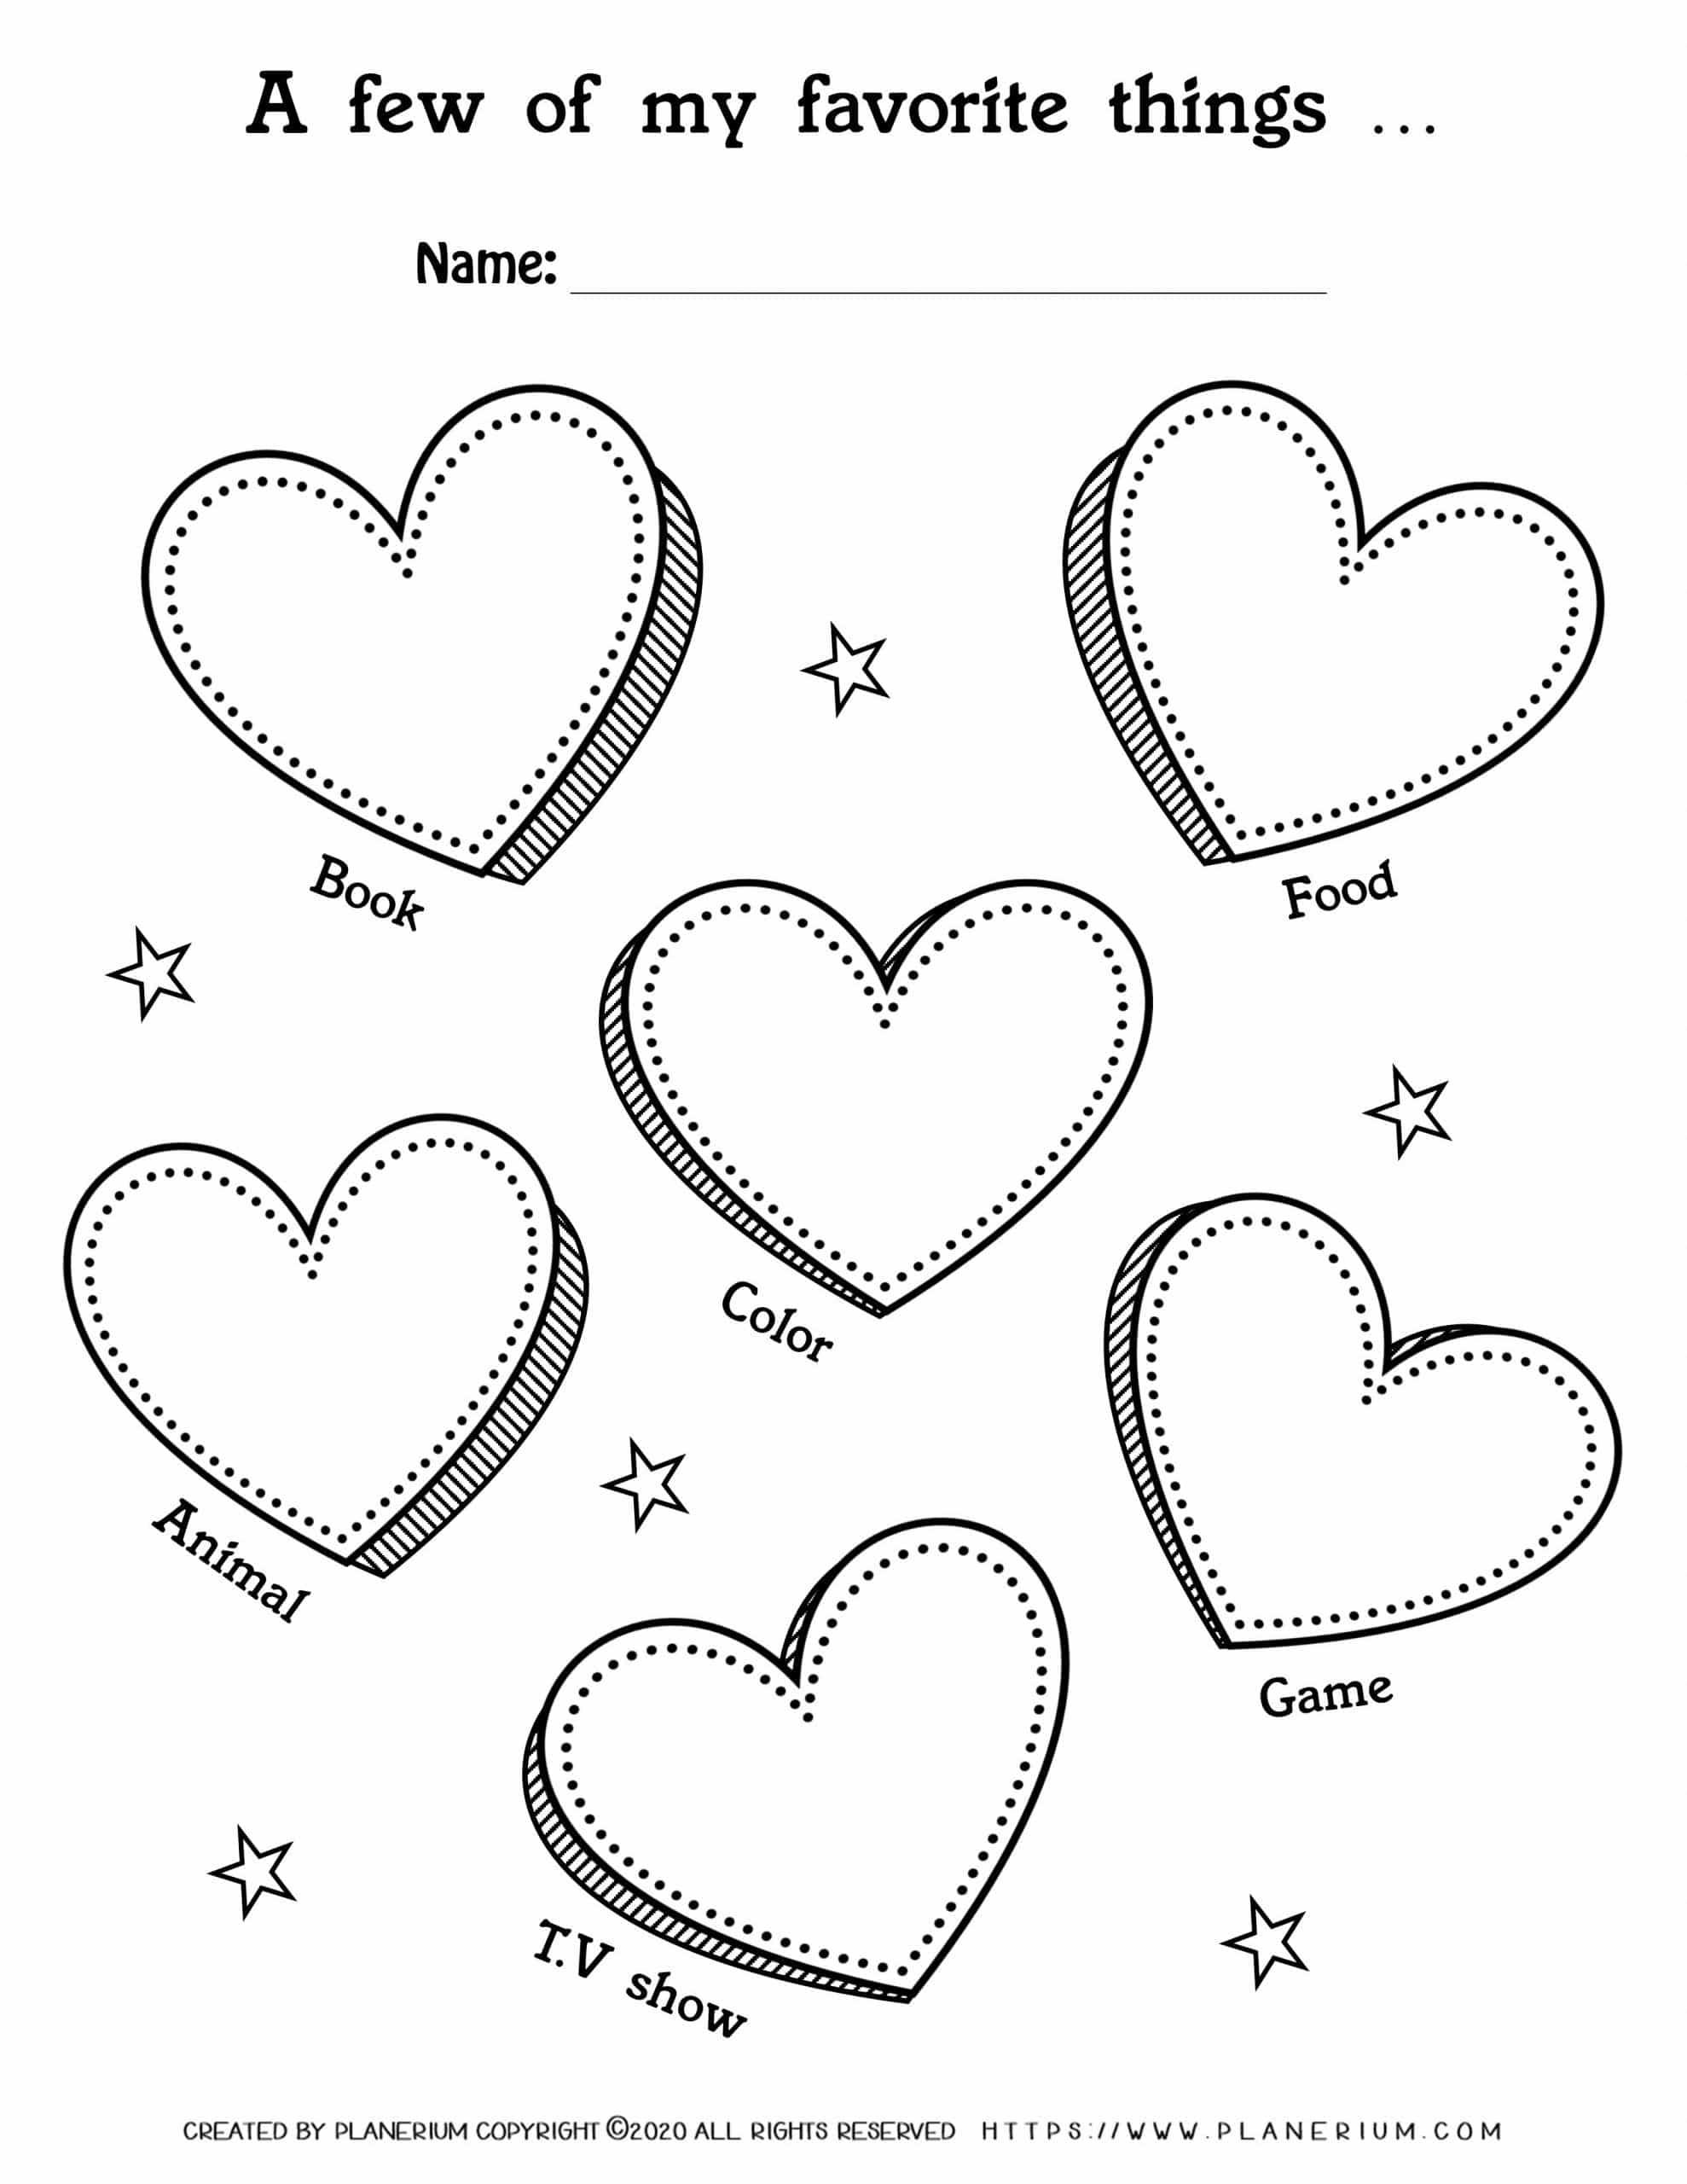 Valentines Day Worksheet - Hearts My favorite things